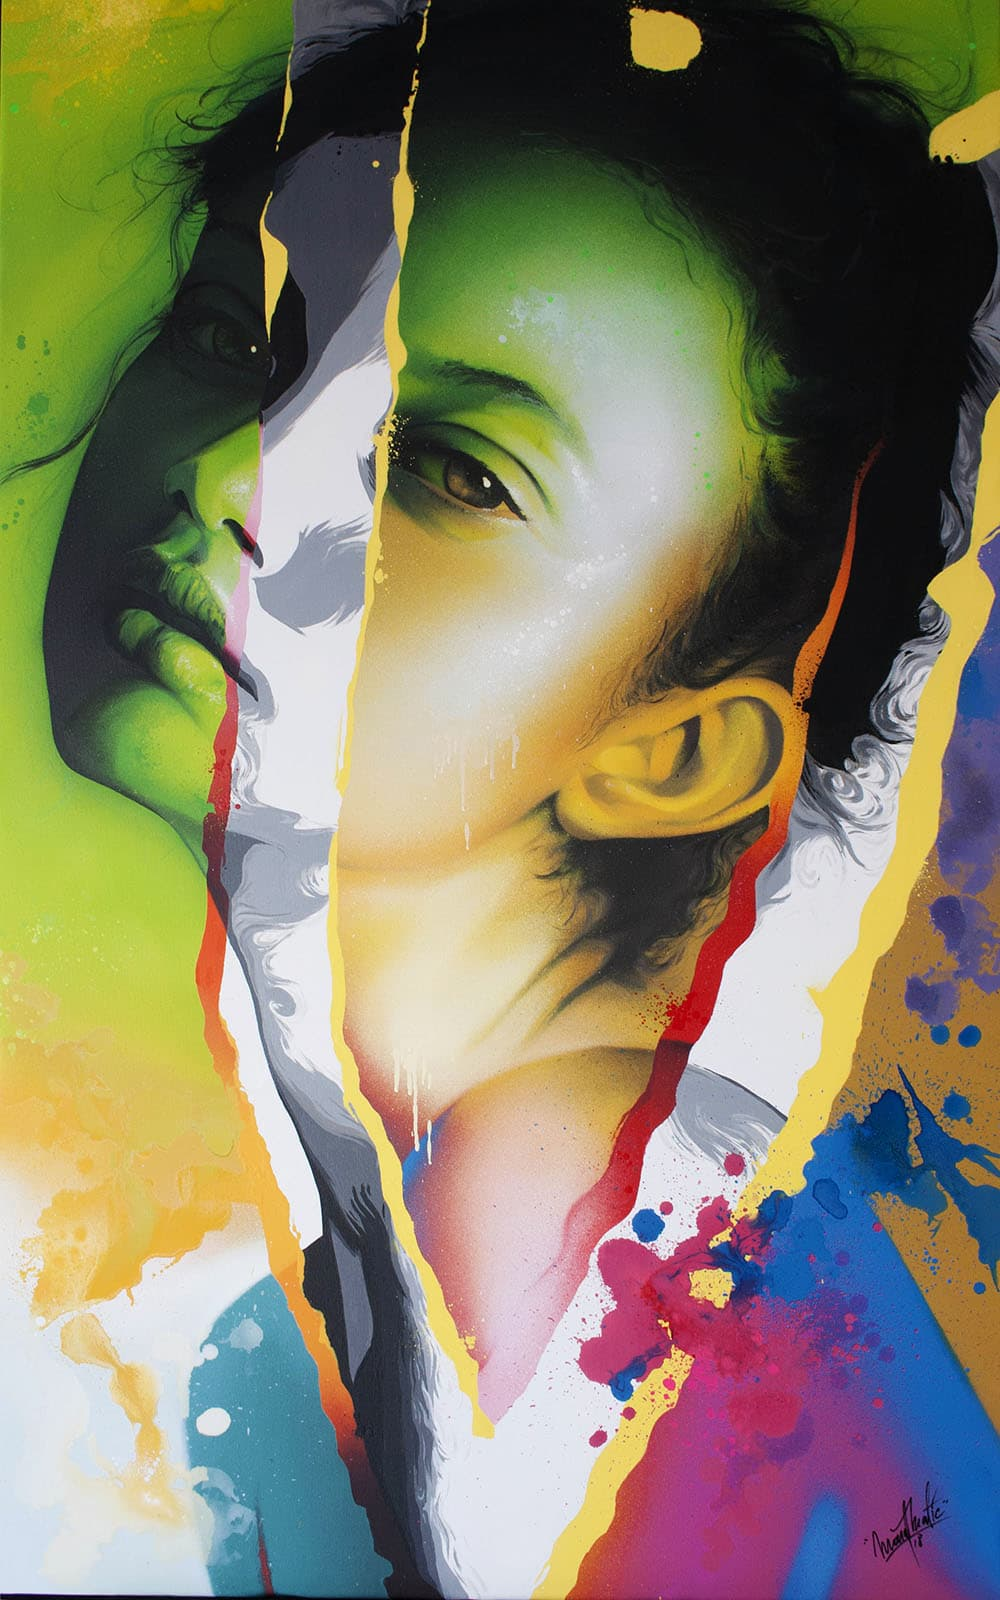 Art about identity